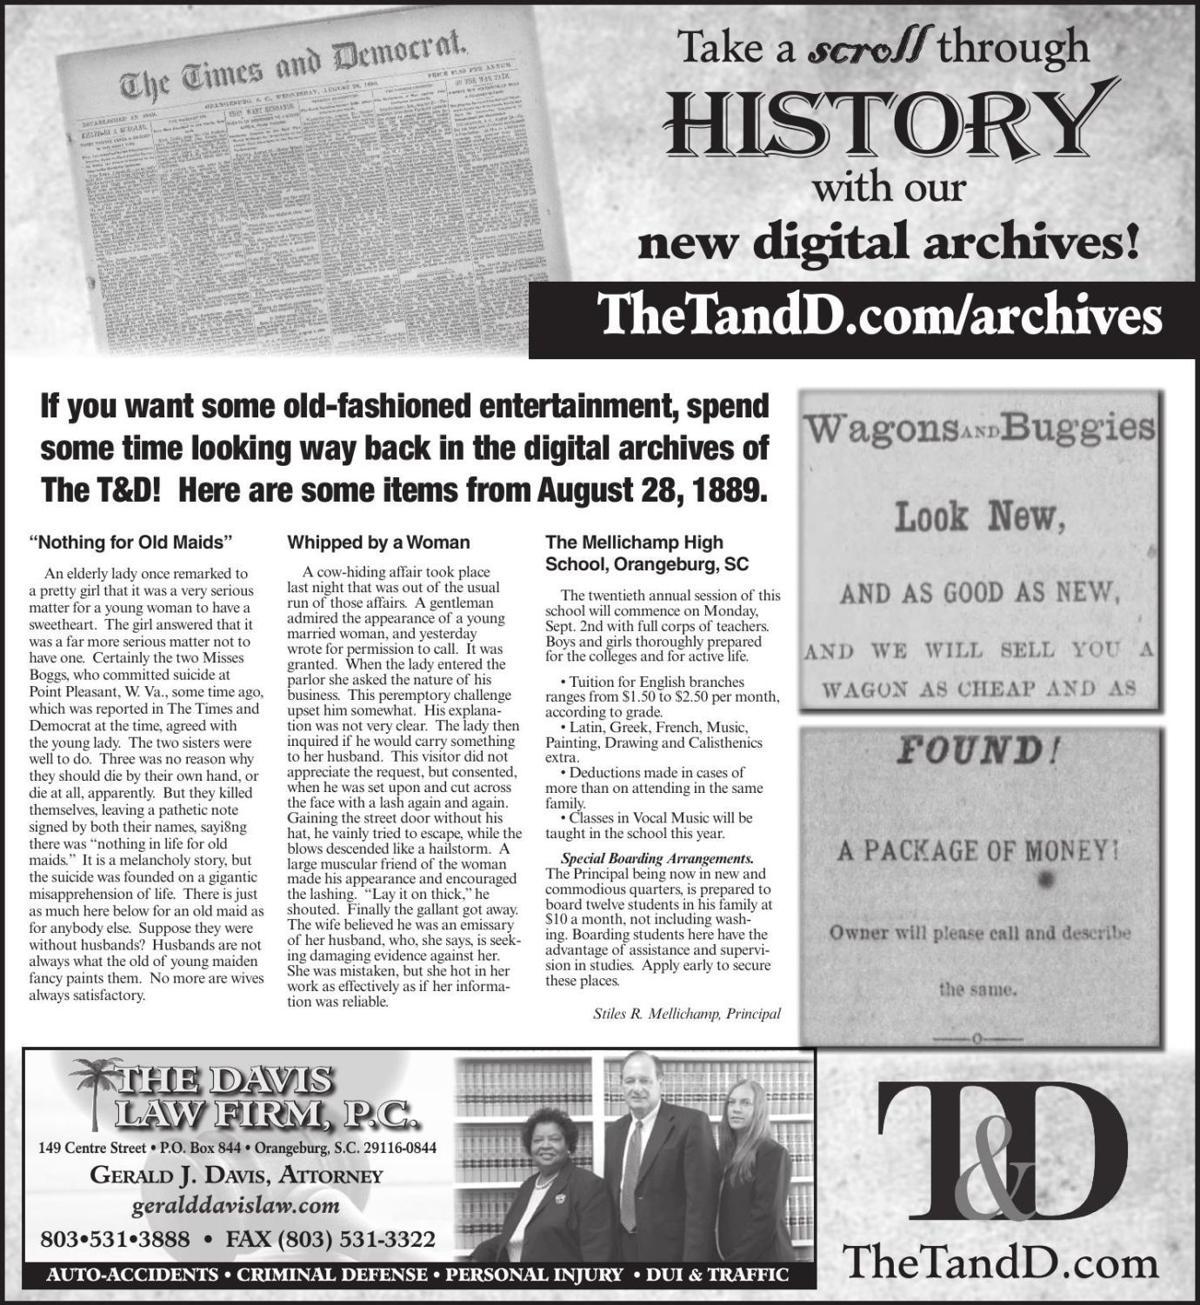 TheTandD.com/archives Aug. 25, 2019